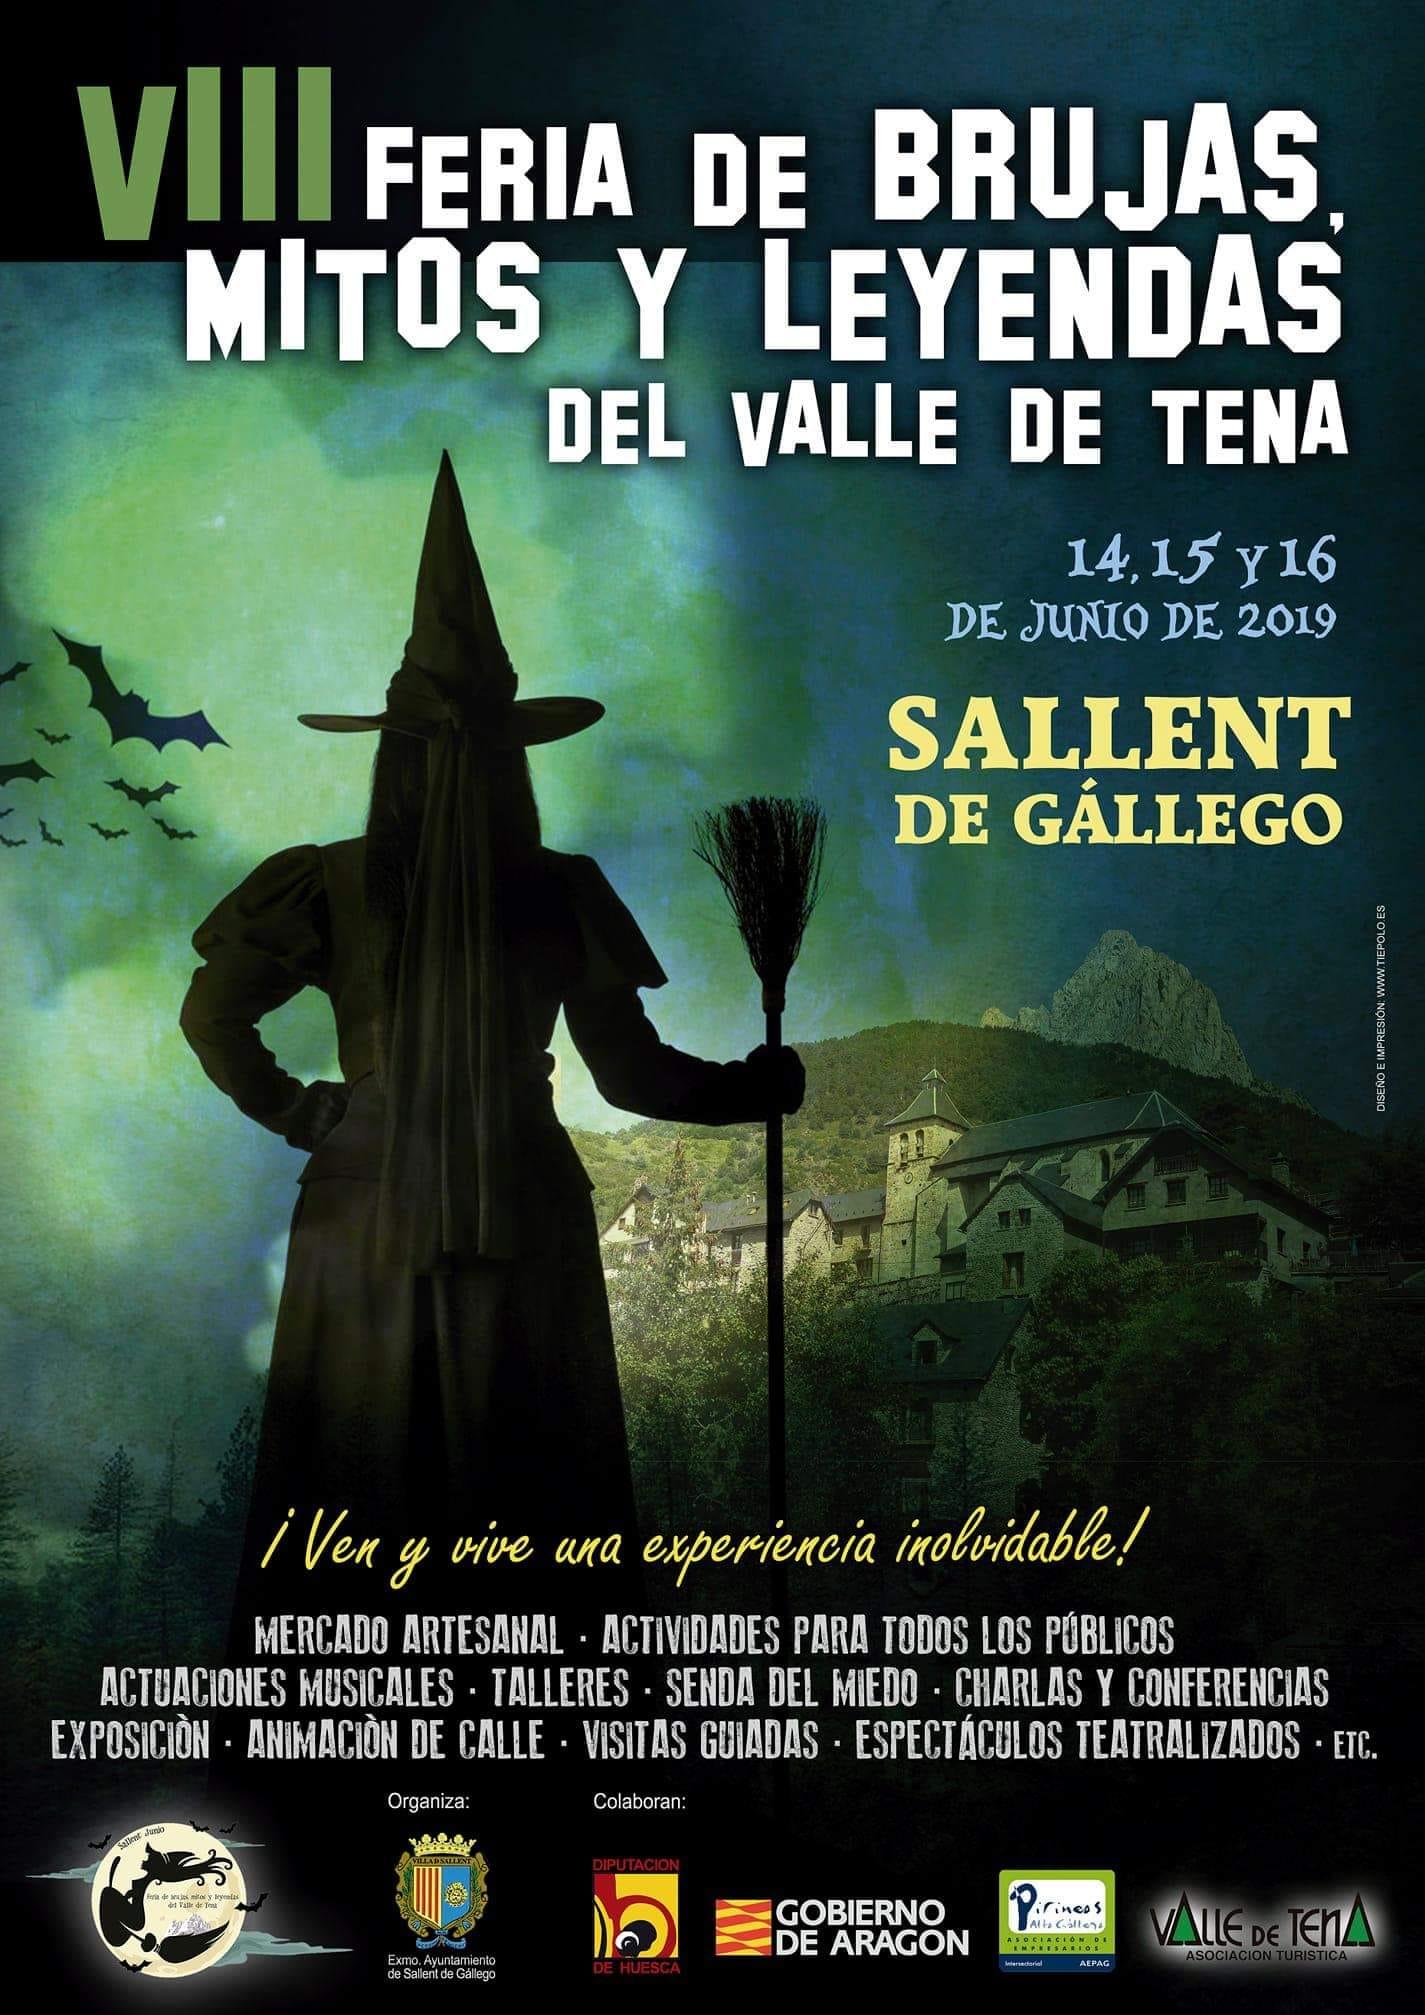 cartel VIII Feria brujas 2019 - pzbaldetena